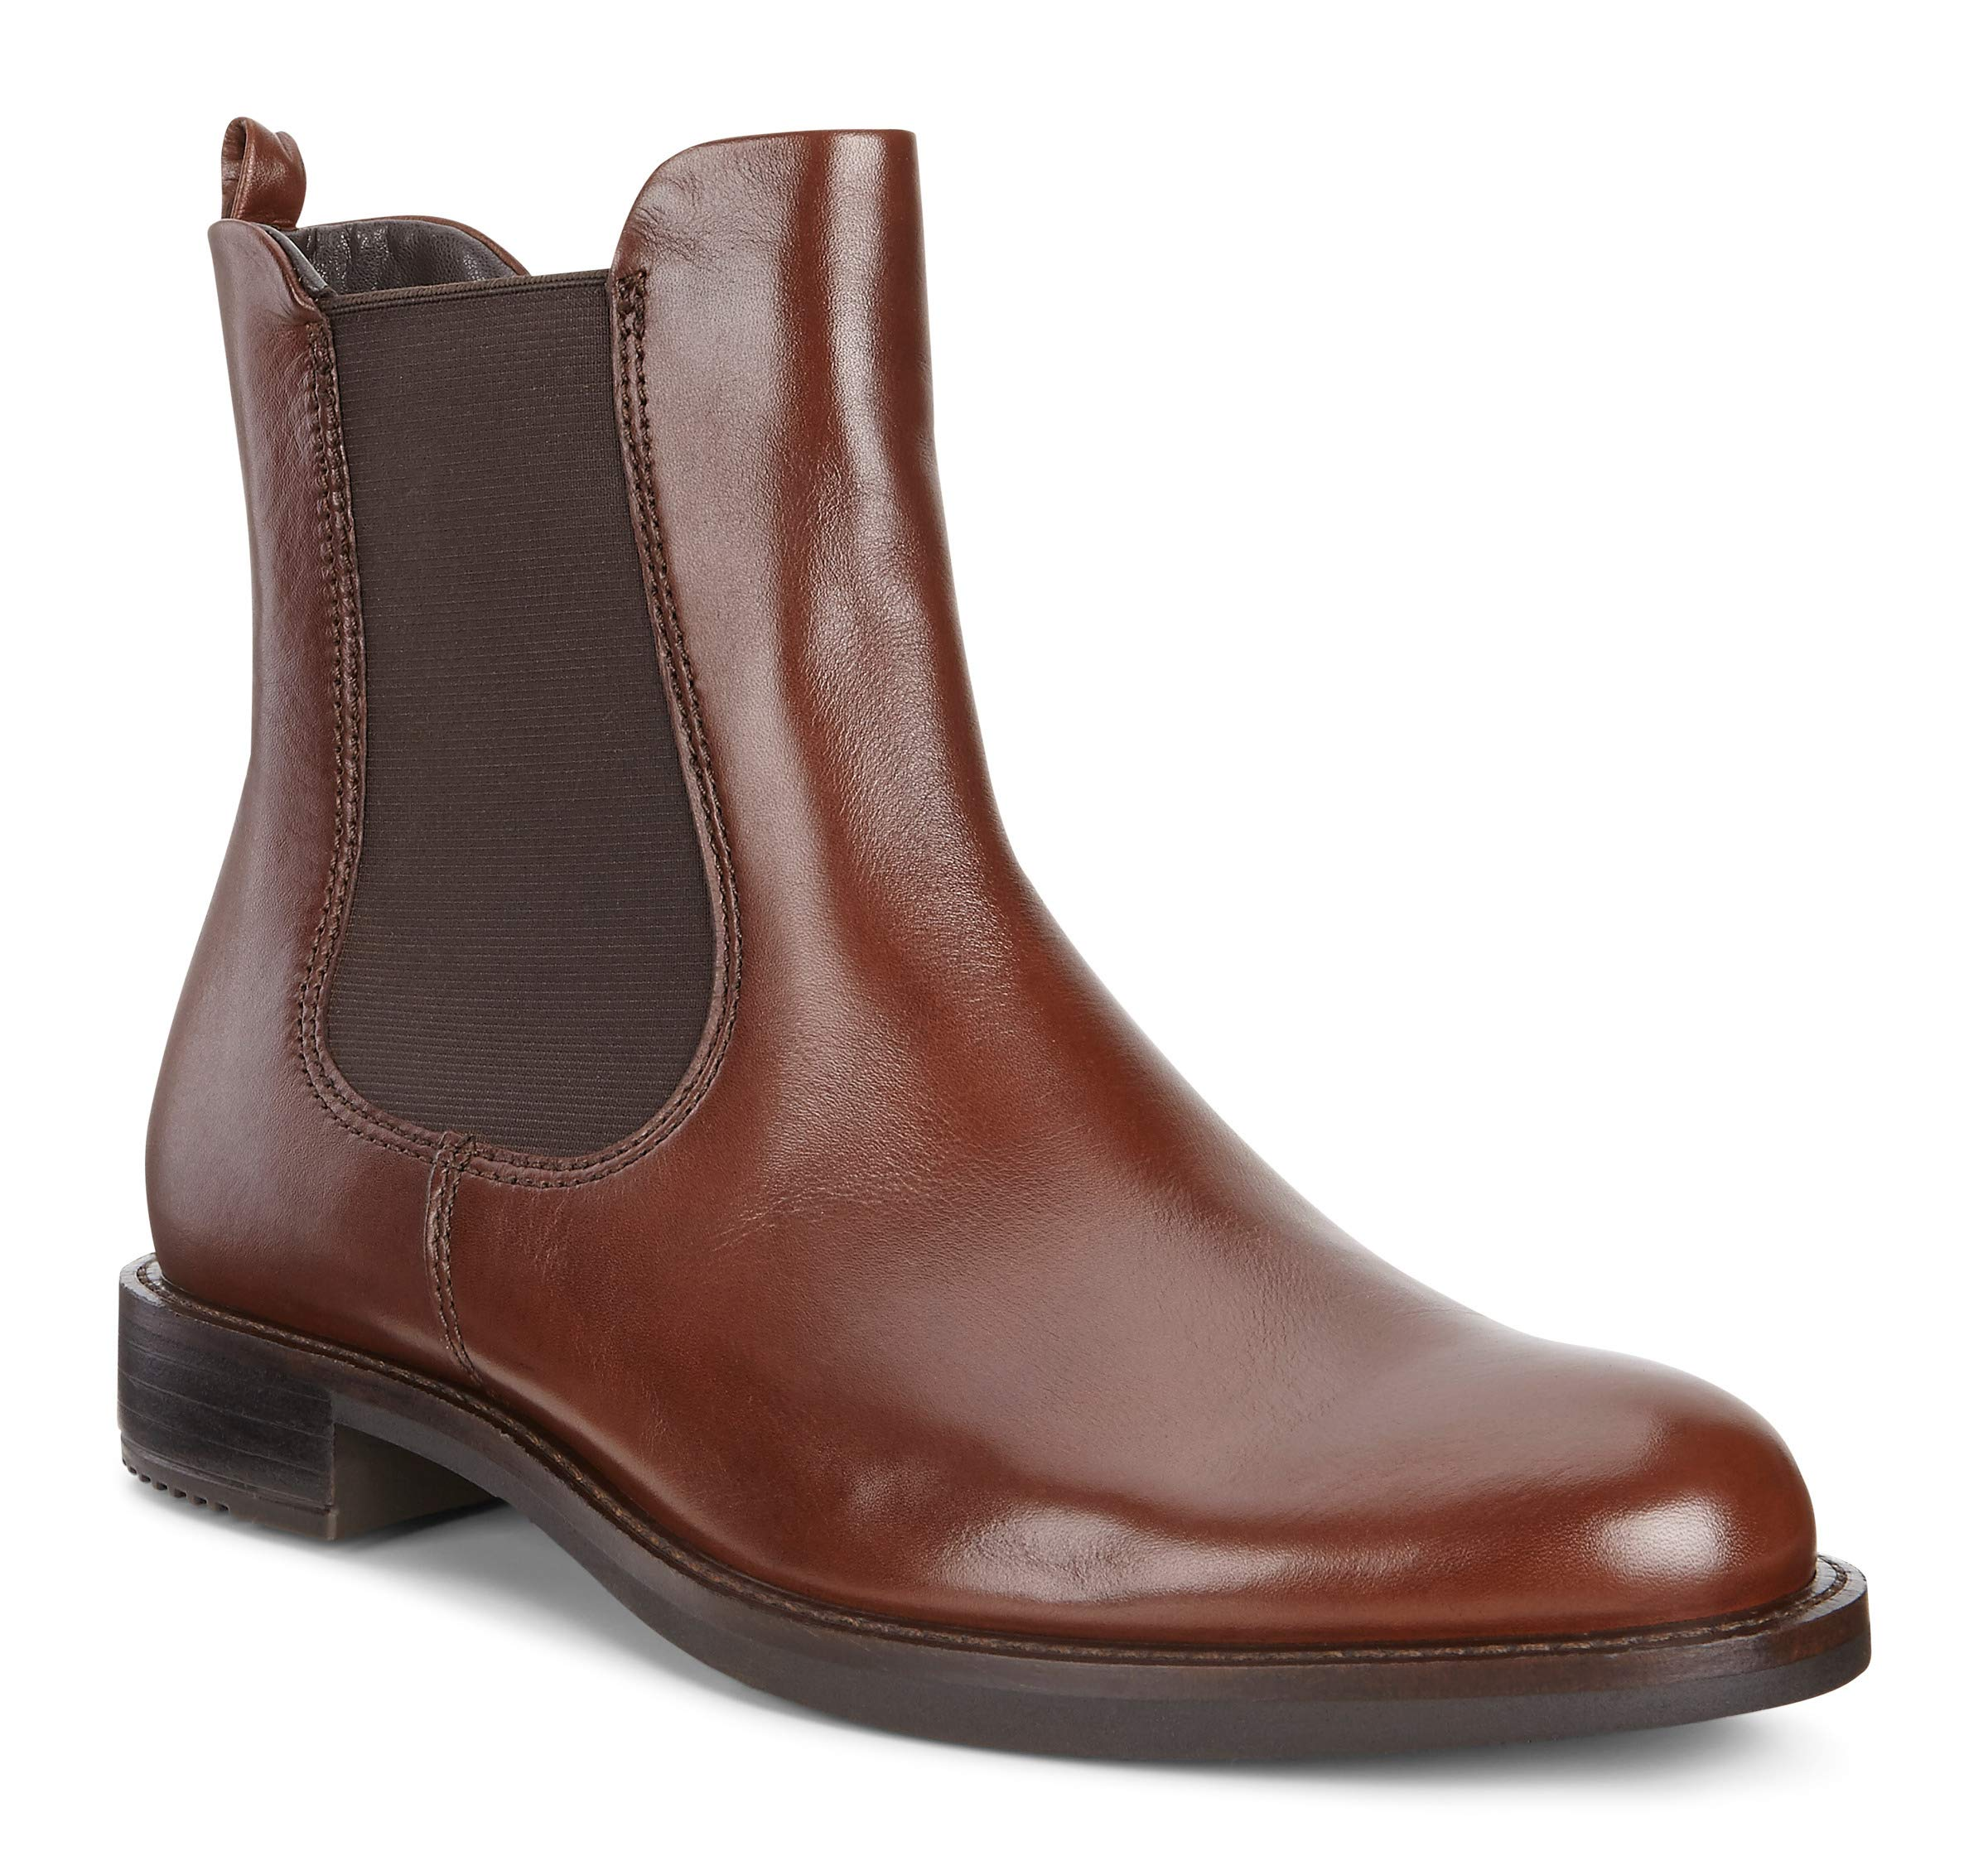 ECCO 爱步 女式 型塑25系列及踝靴 短靴 切尔西靴